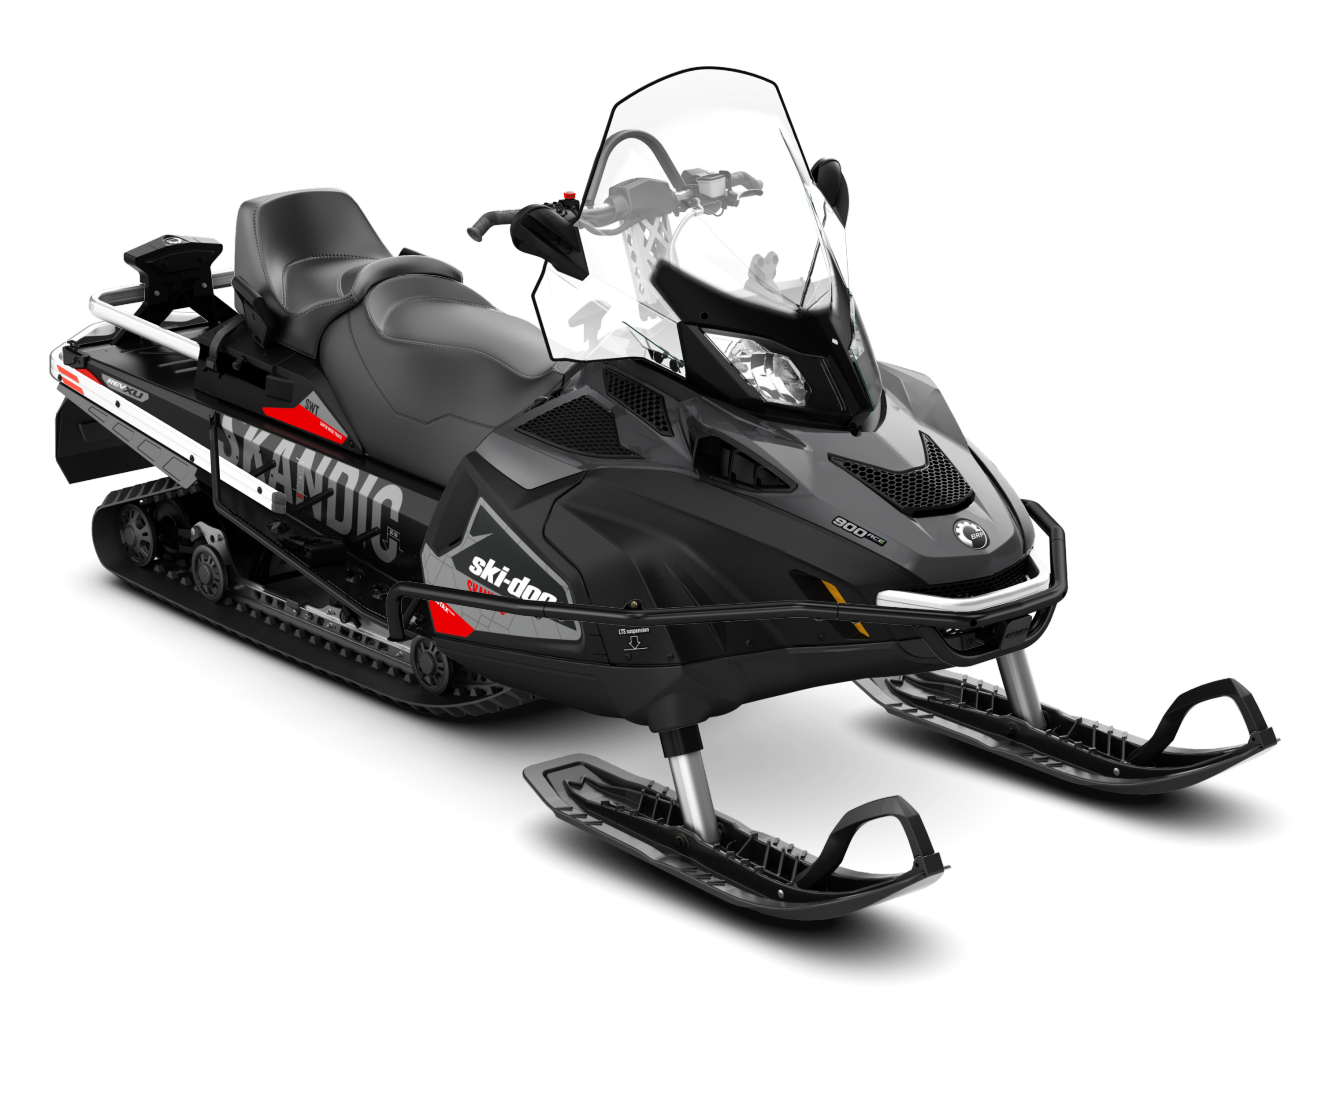 Vehicle Configuration Ski Doo Snow Mobile Skandic Swt Custom Build Snowmobile Atv Riding Tesla Car